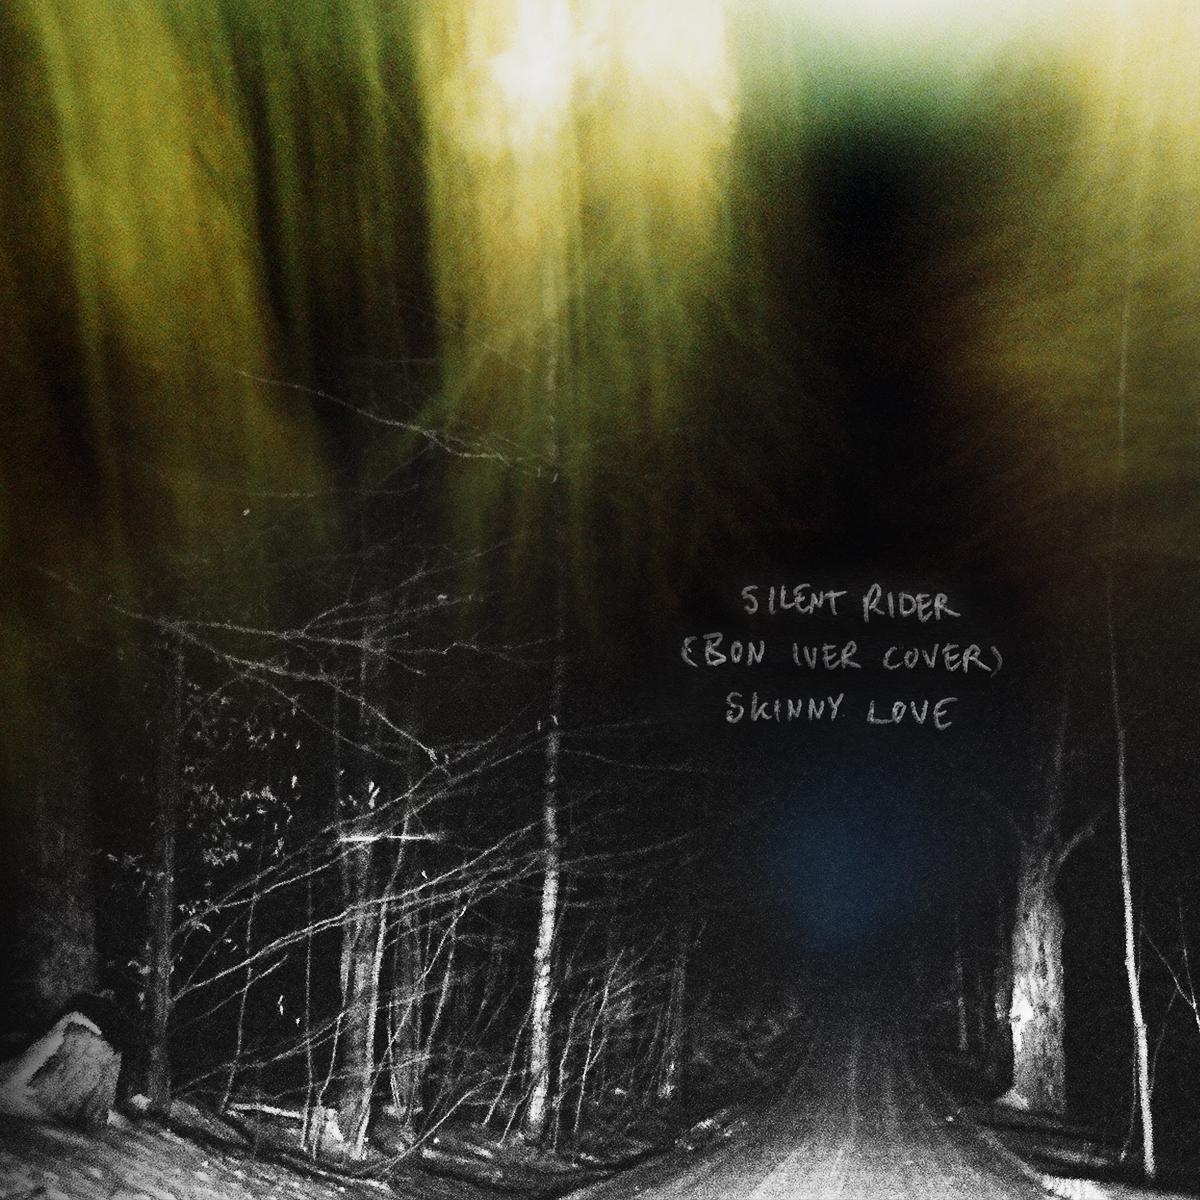 Skinny Love Cover Art